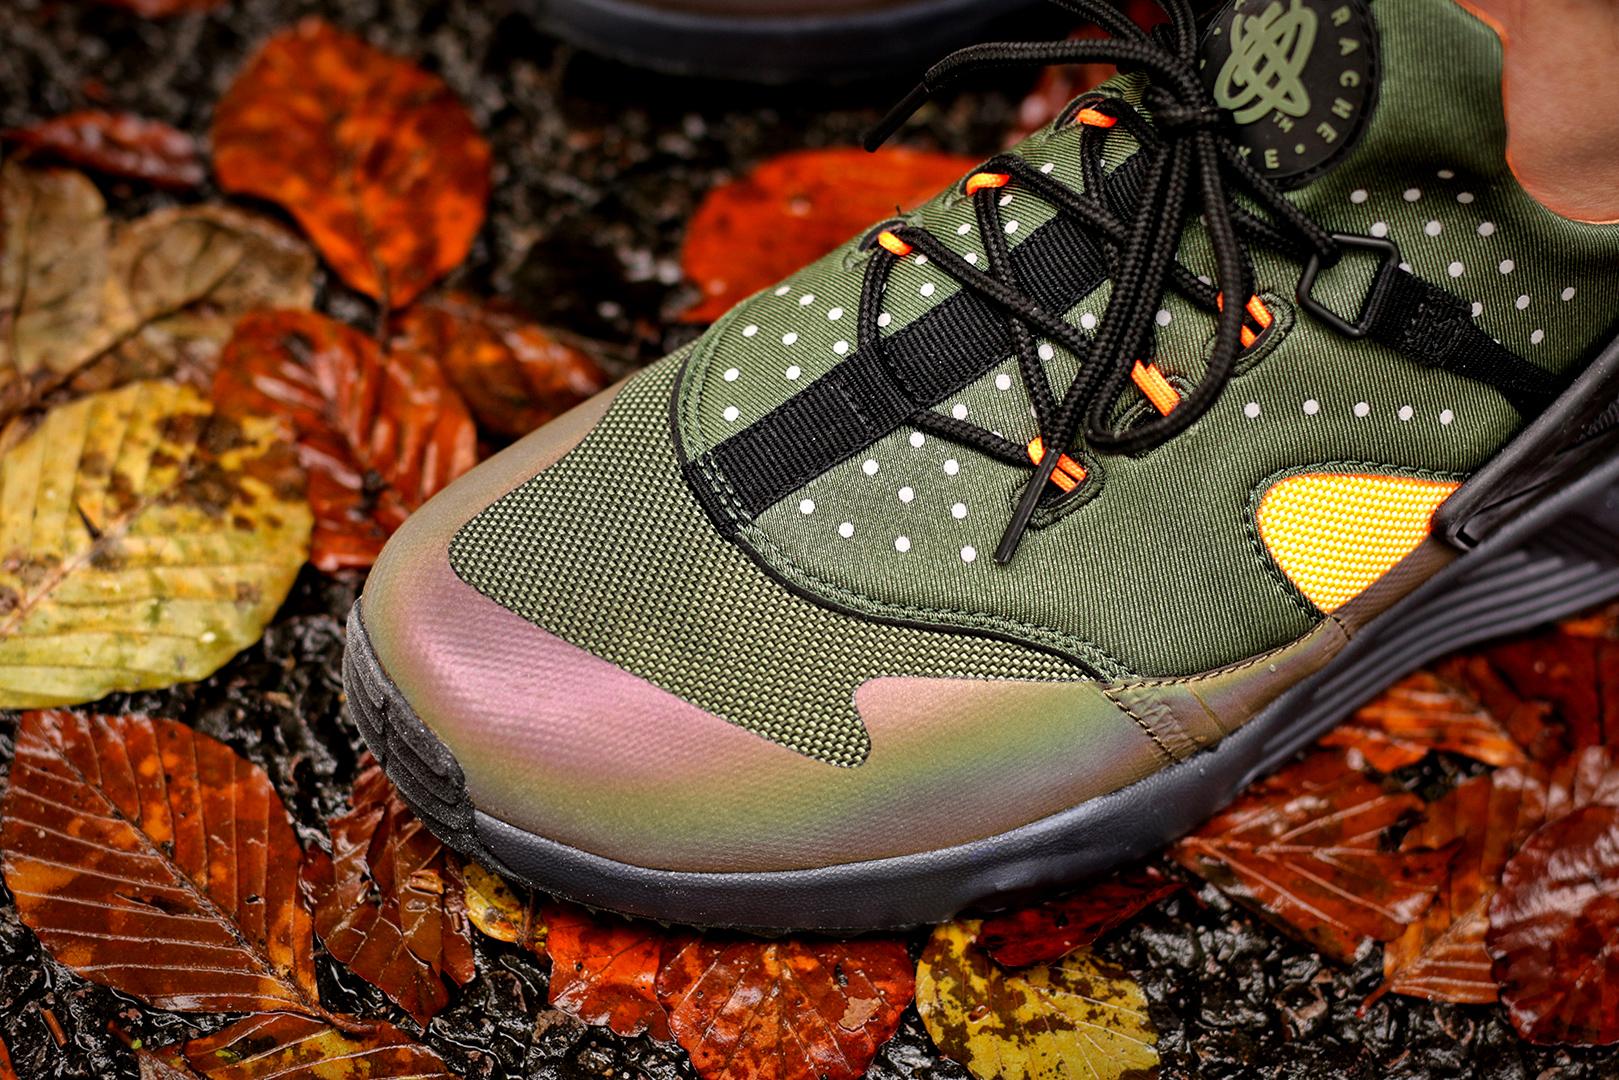 Nike huarache release dates in Australia